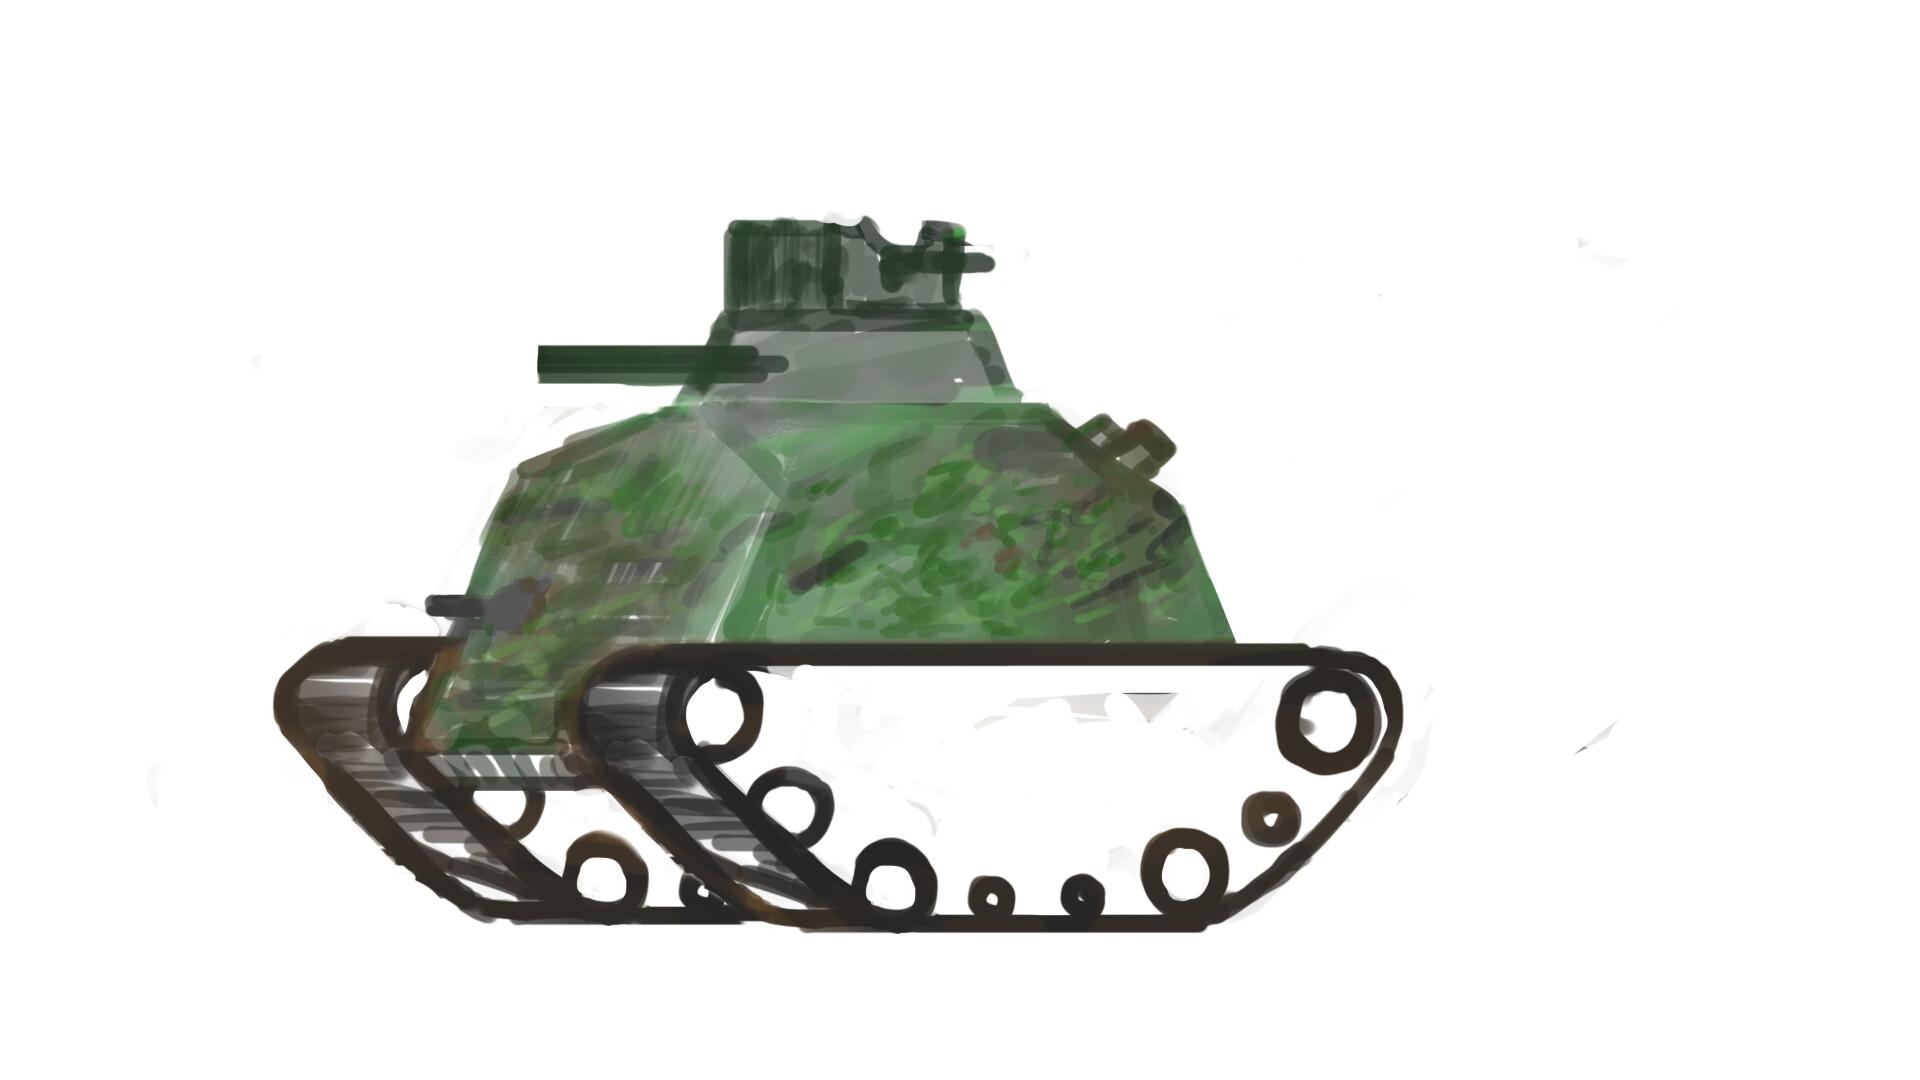 Alexander laheij tank